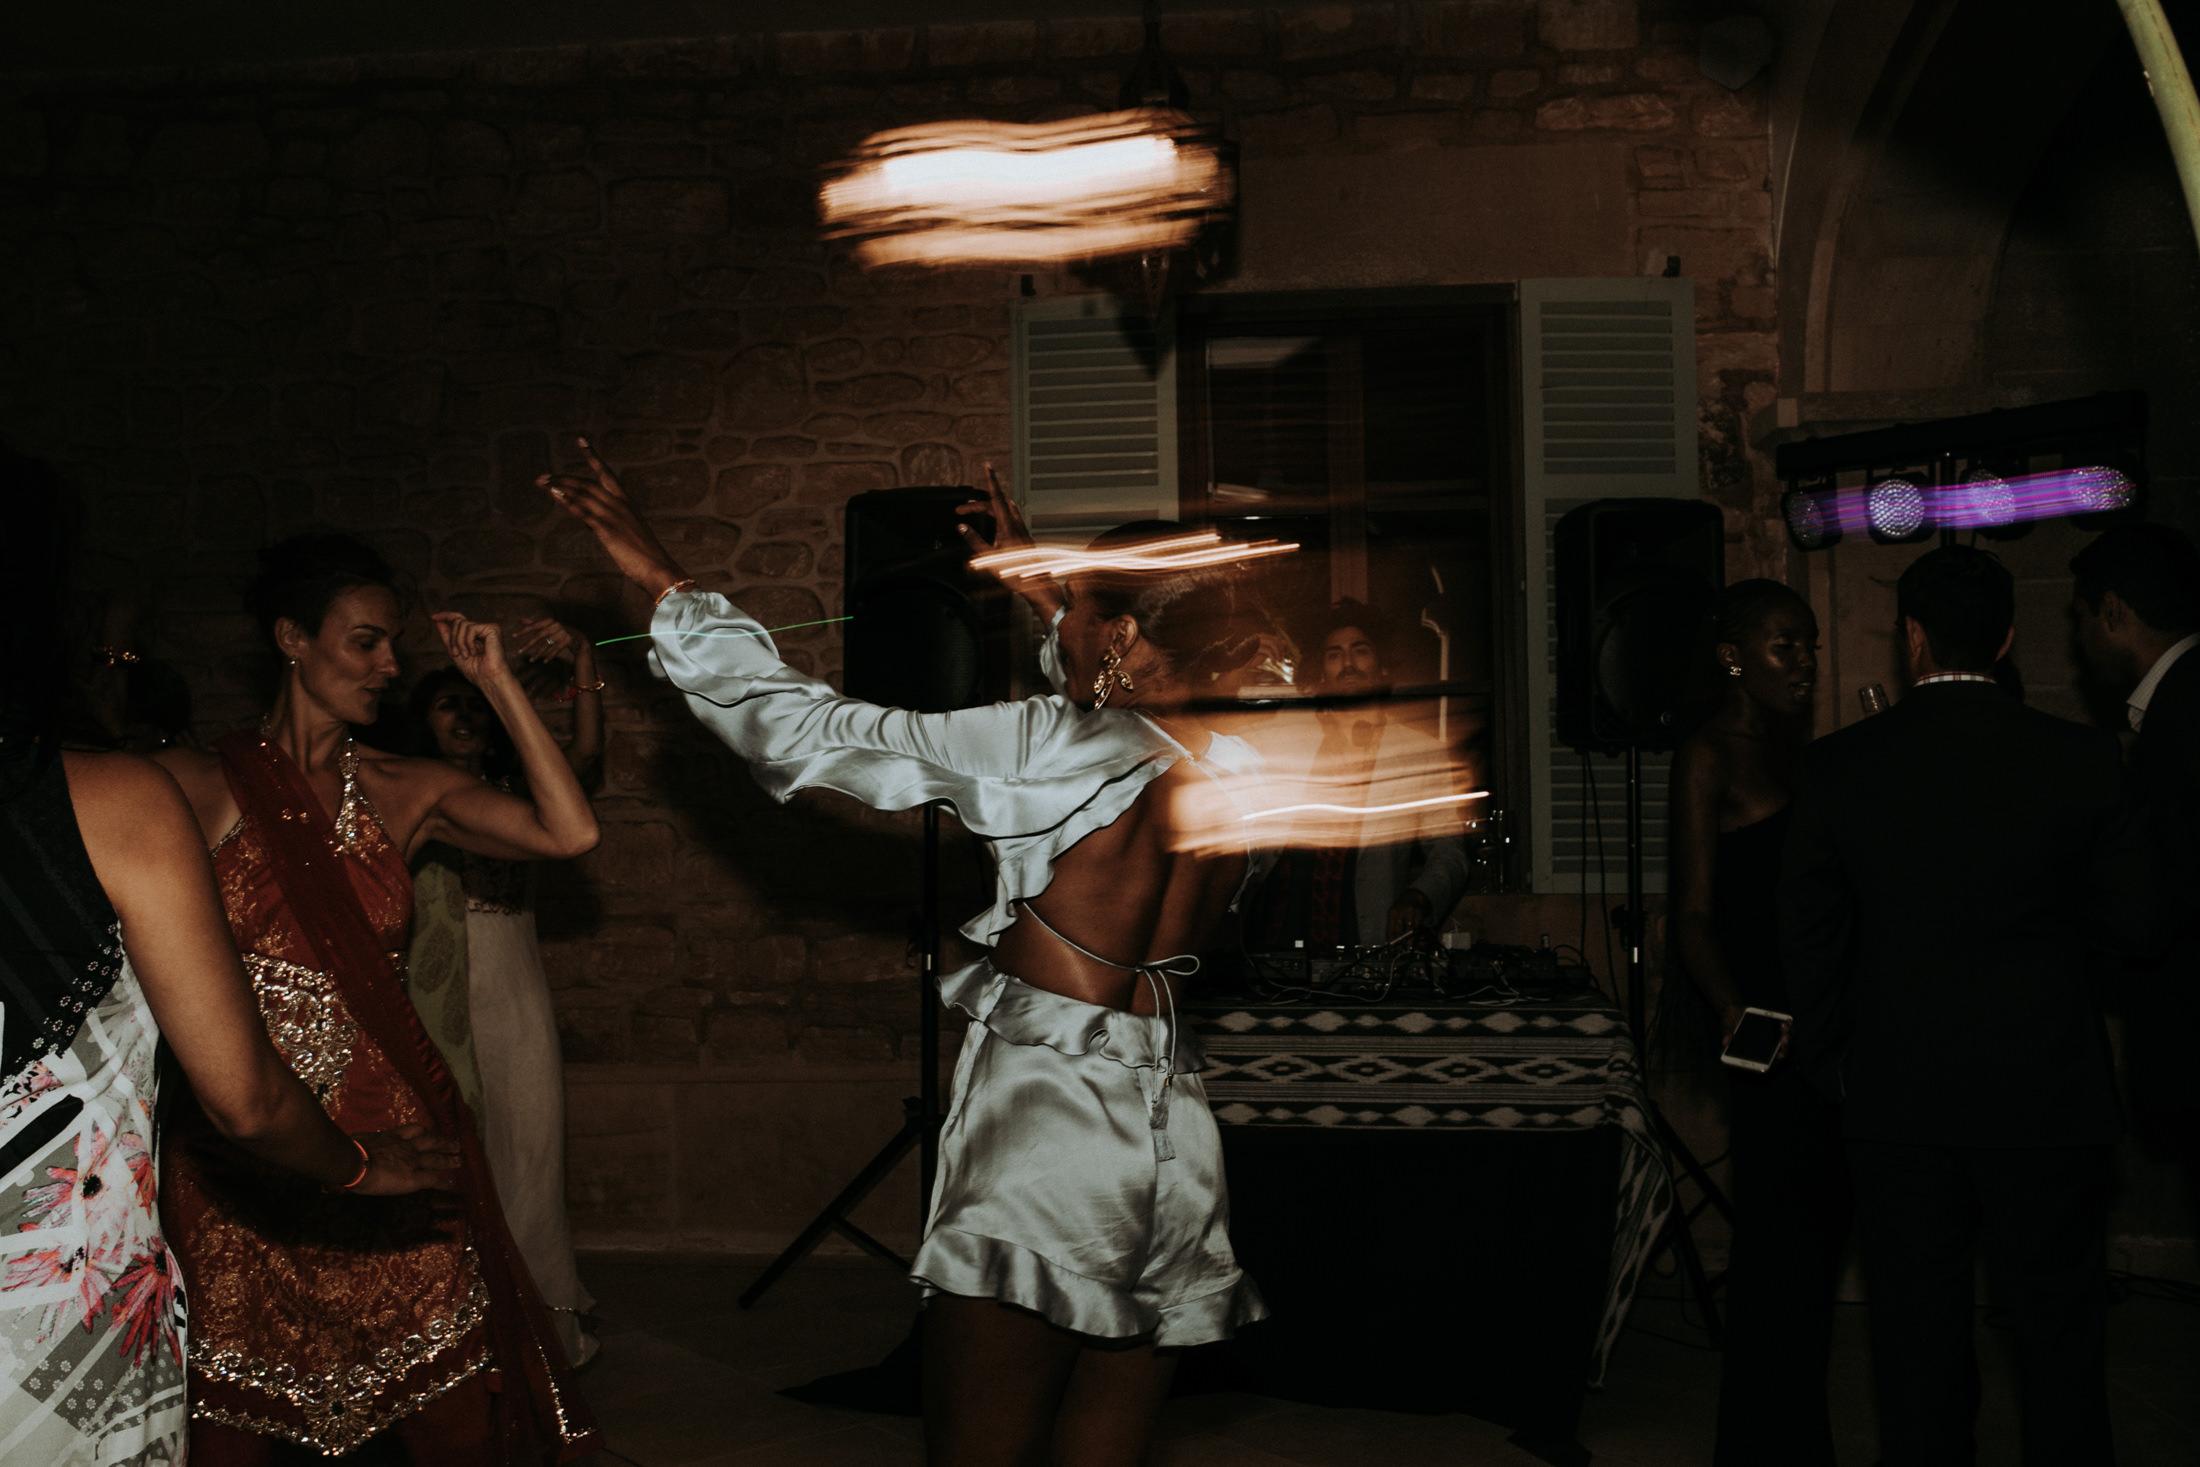 Wedding_Photographer_Mallorca_Daniela-Marquardt_Photography_New_York_Iceland_Tuscany_Santorini_Portugal_Austria_Bavaria_Elopement_Hochzeitsfotograf_AntjeRajat1_53